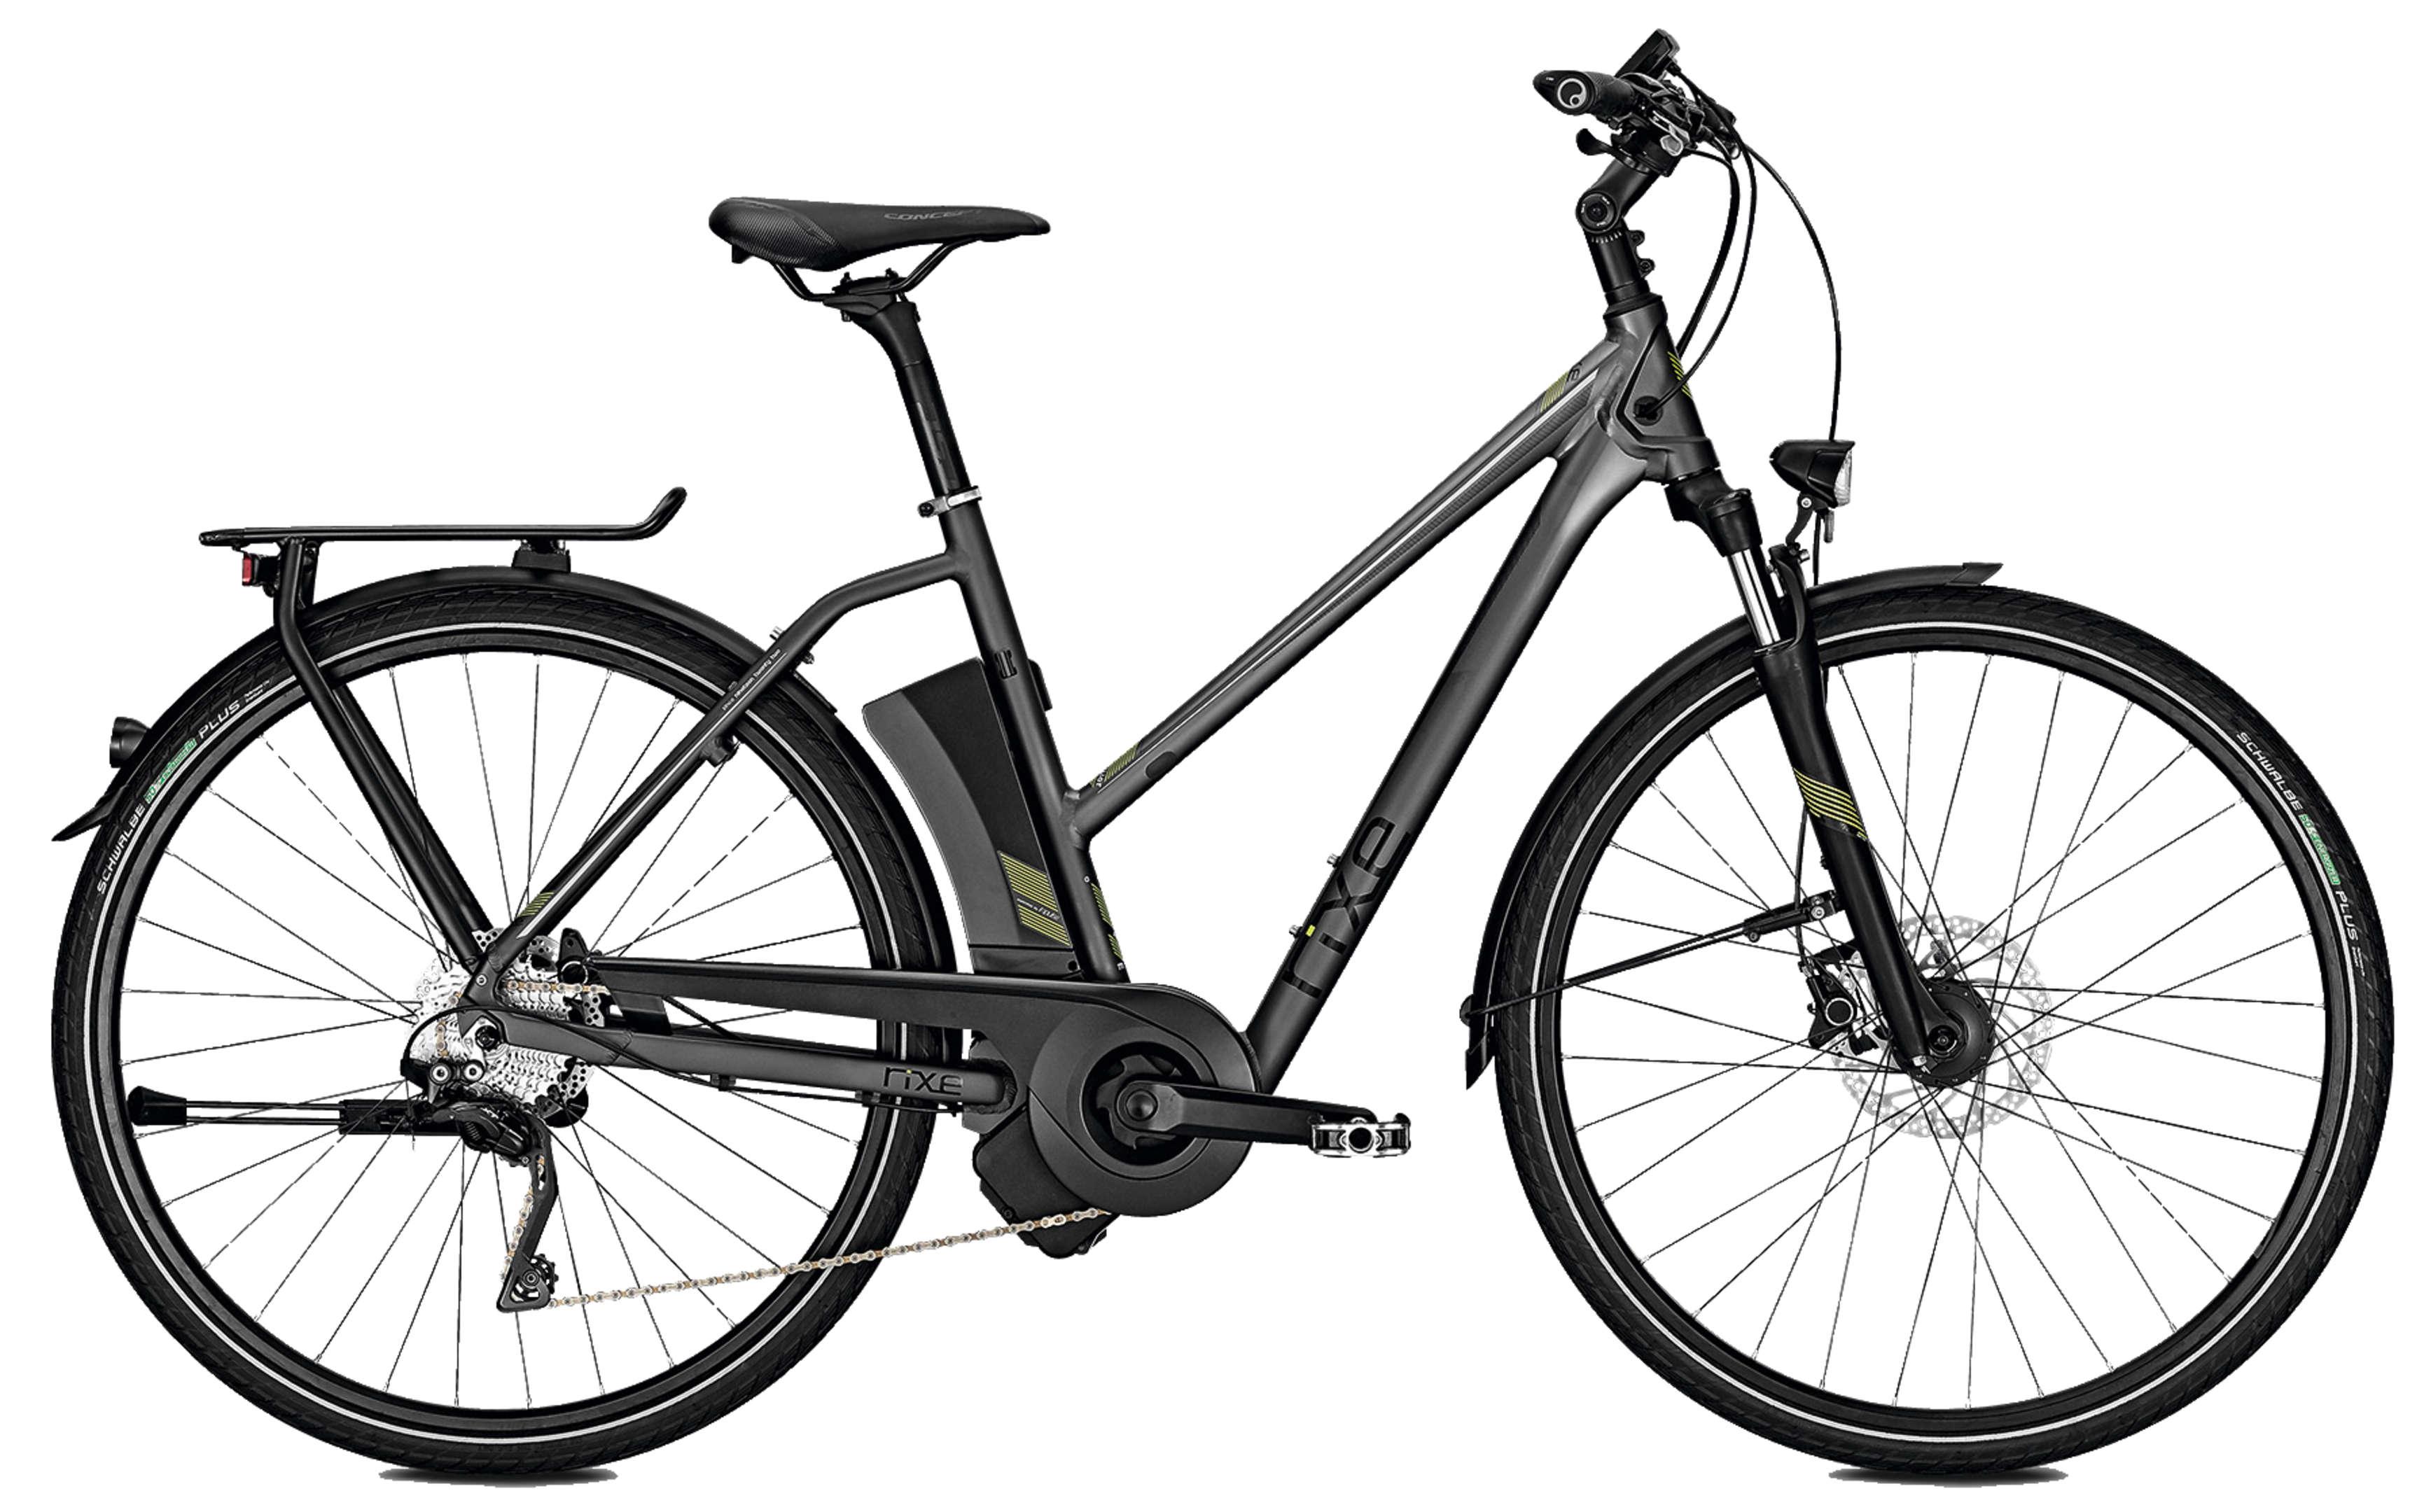 rixe e bike montpellier i10 xt 17 0ah 36v eurorad bikeleasingeurorad bikeleasing. Black Bedroom Furniture Sets. Home Design Ideas